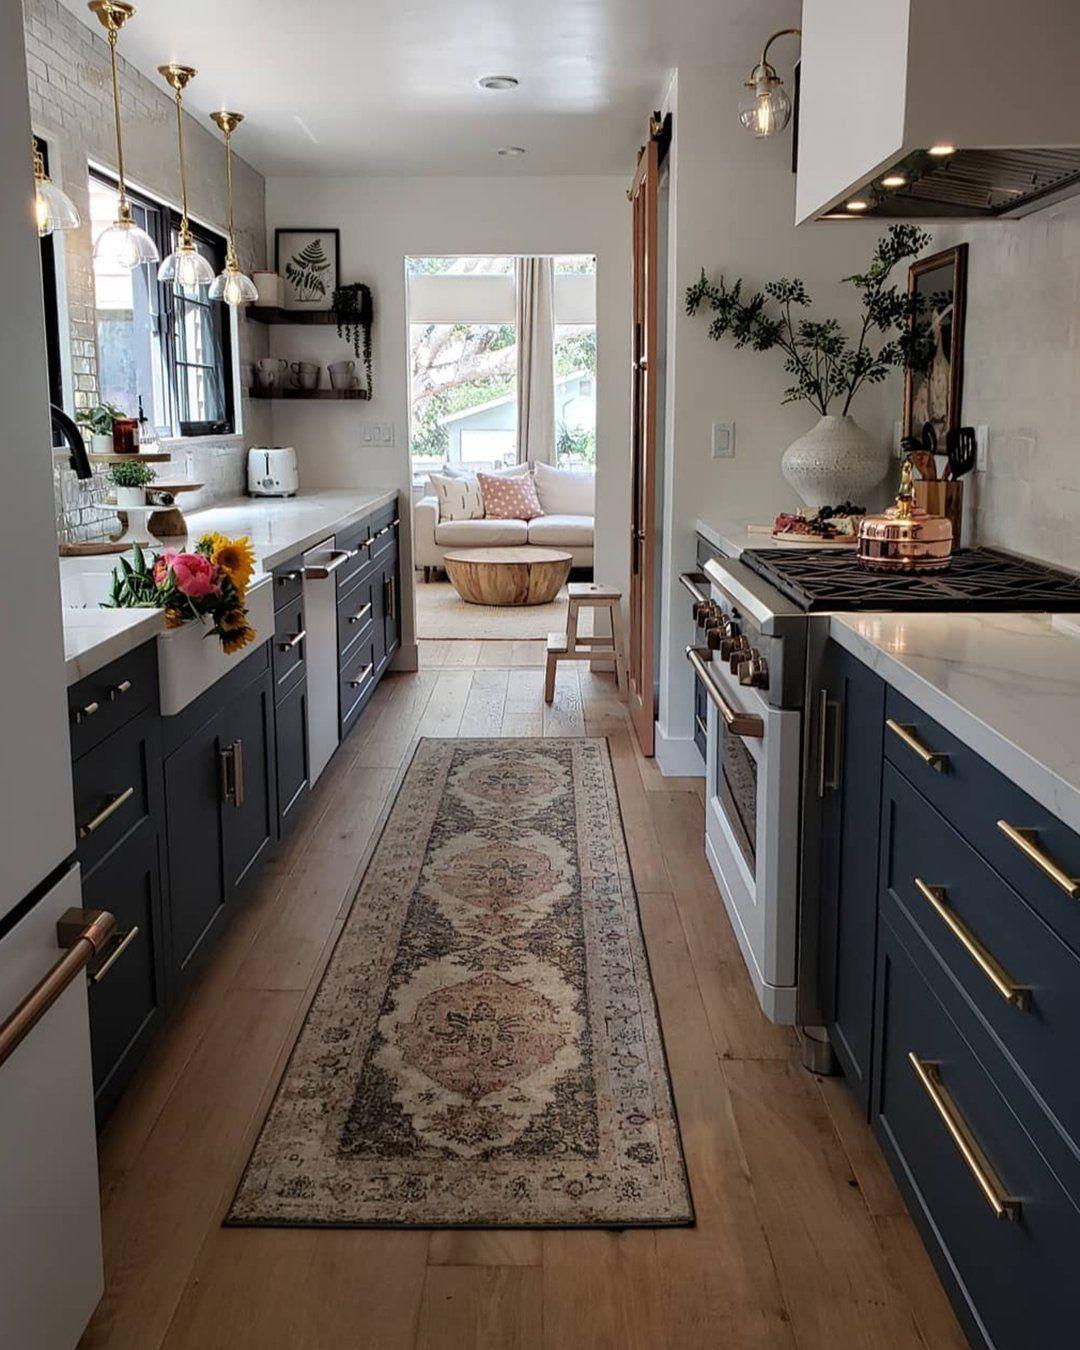 home decor kitchen #homedecor Amazing Galley Kitchen in Dark, Night Sky Shaker Semihandmade